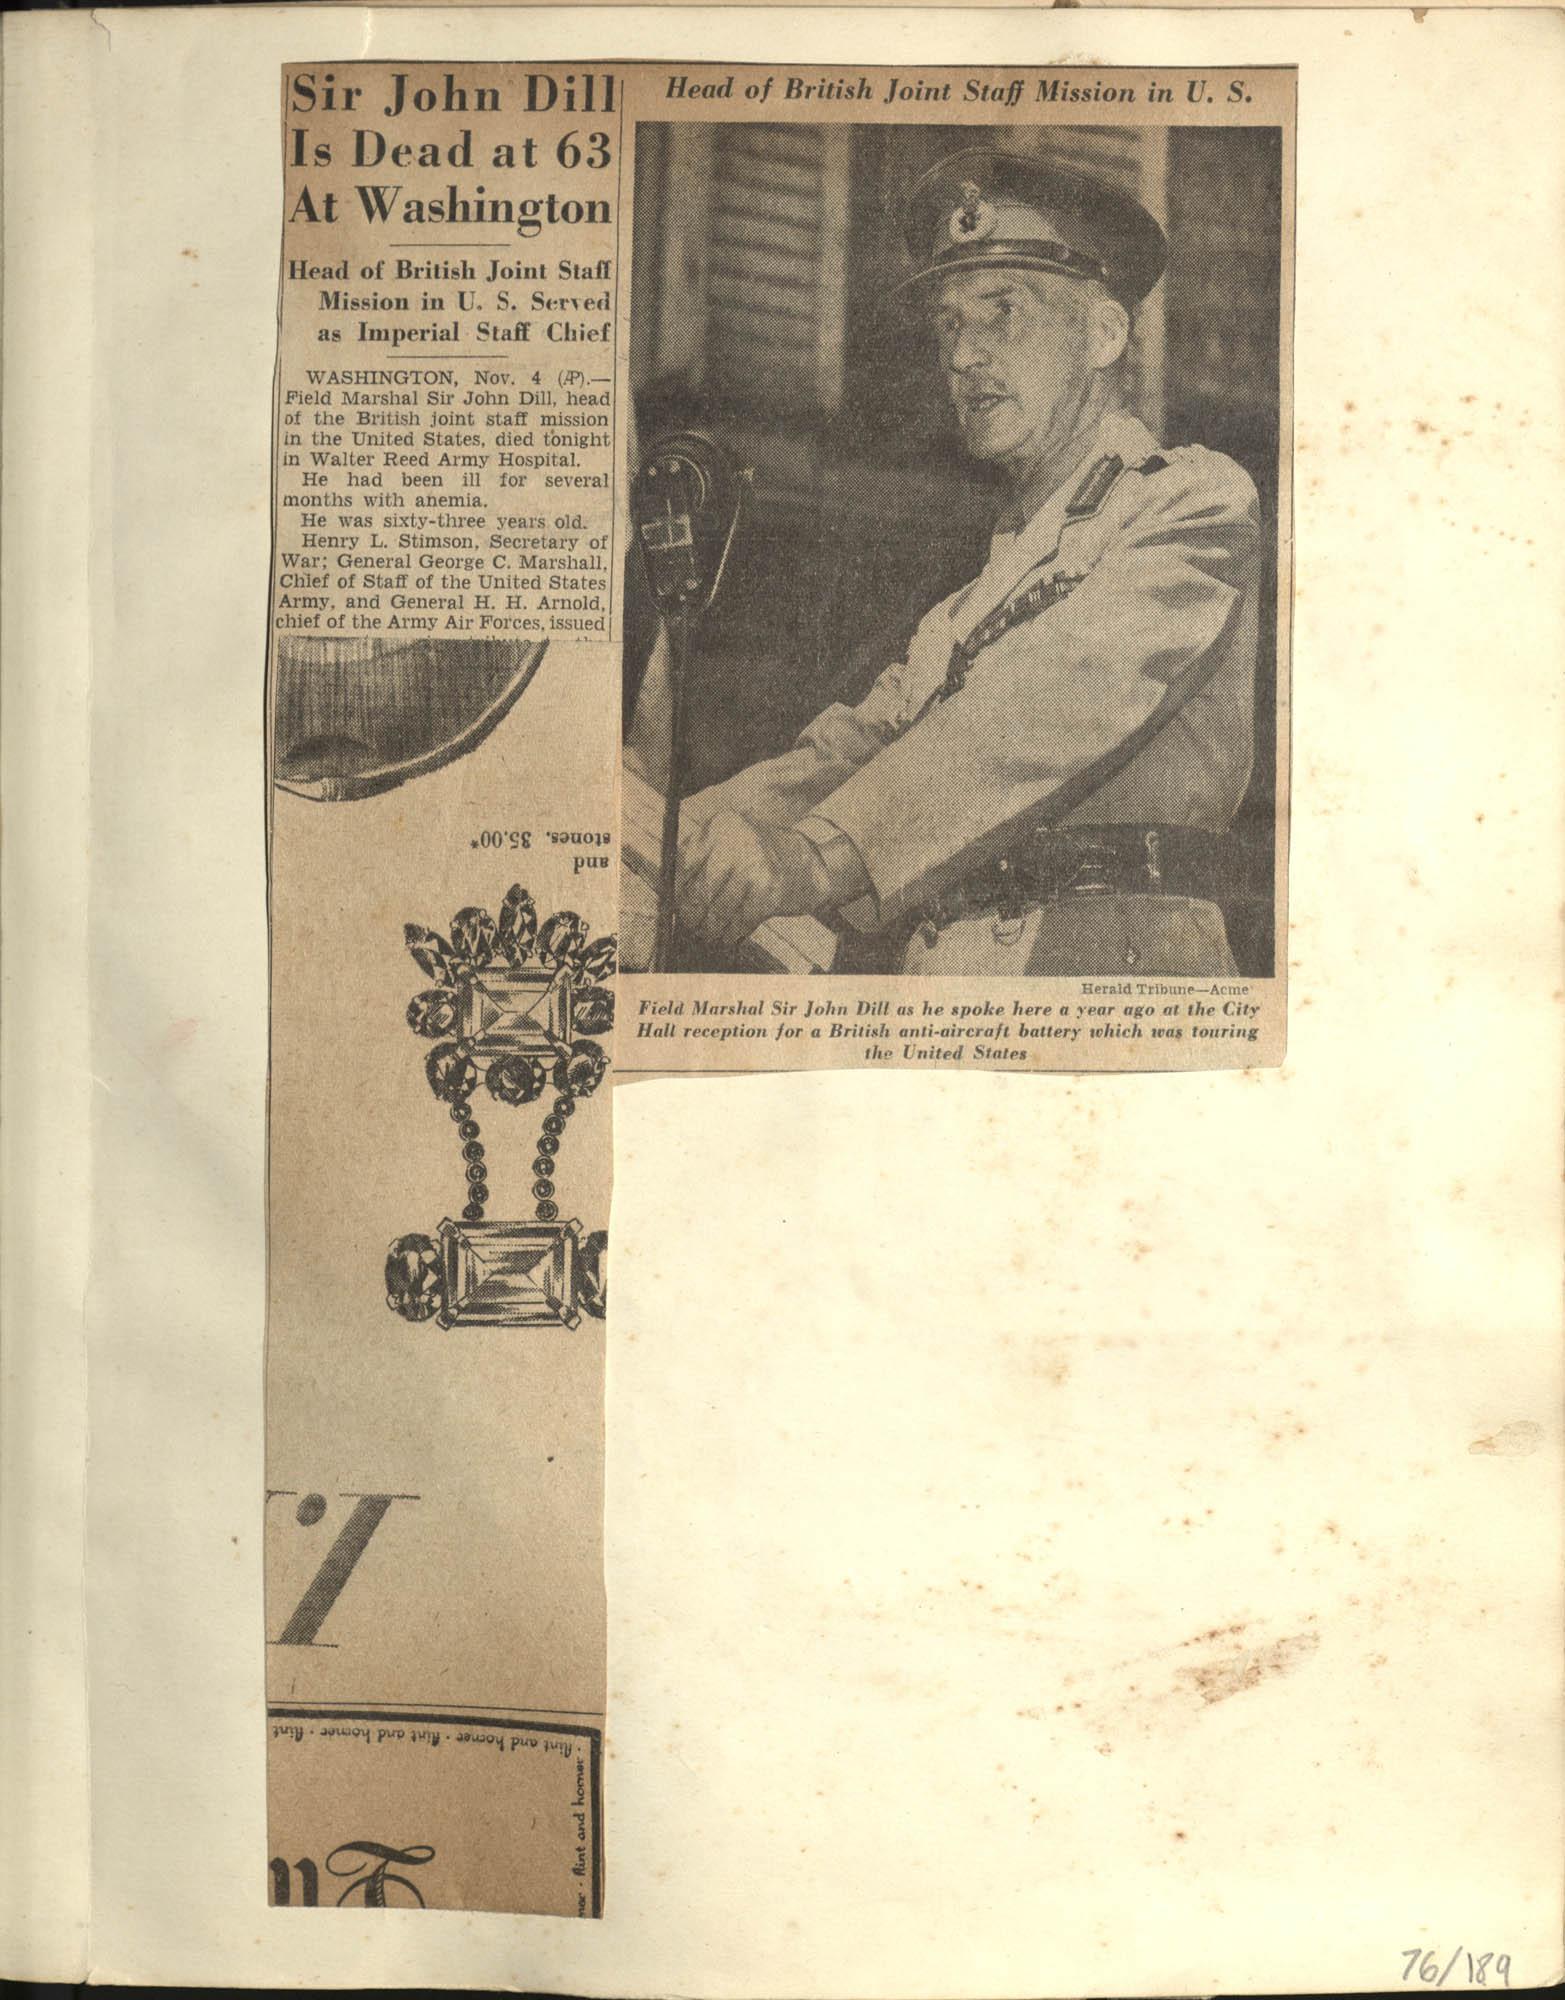 Gertrude Legendre OSS Scrapbook, 1944, Page 76